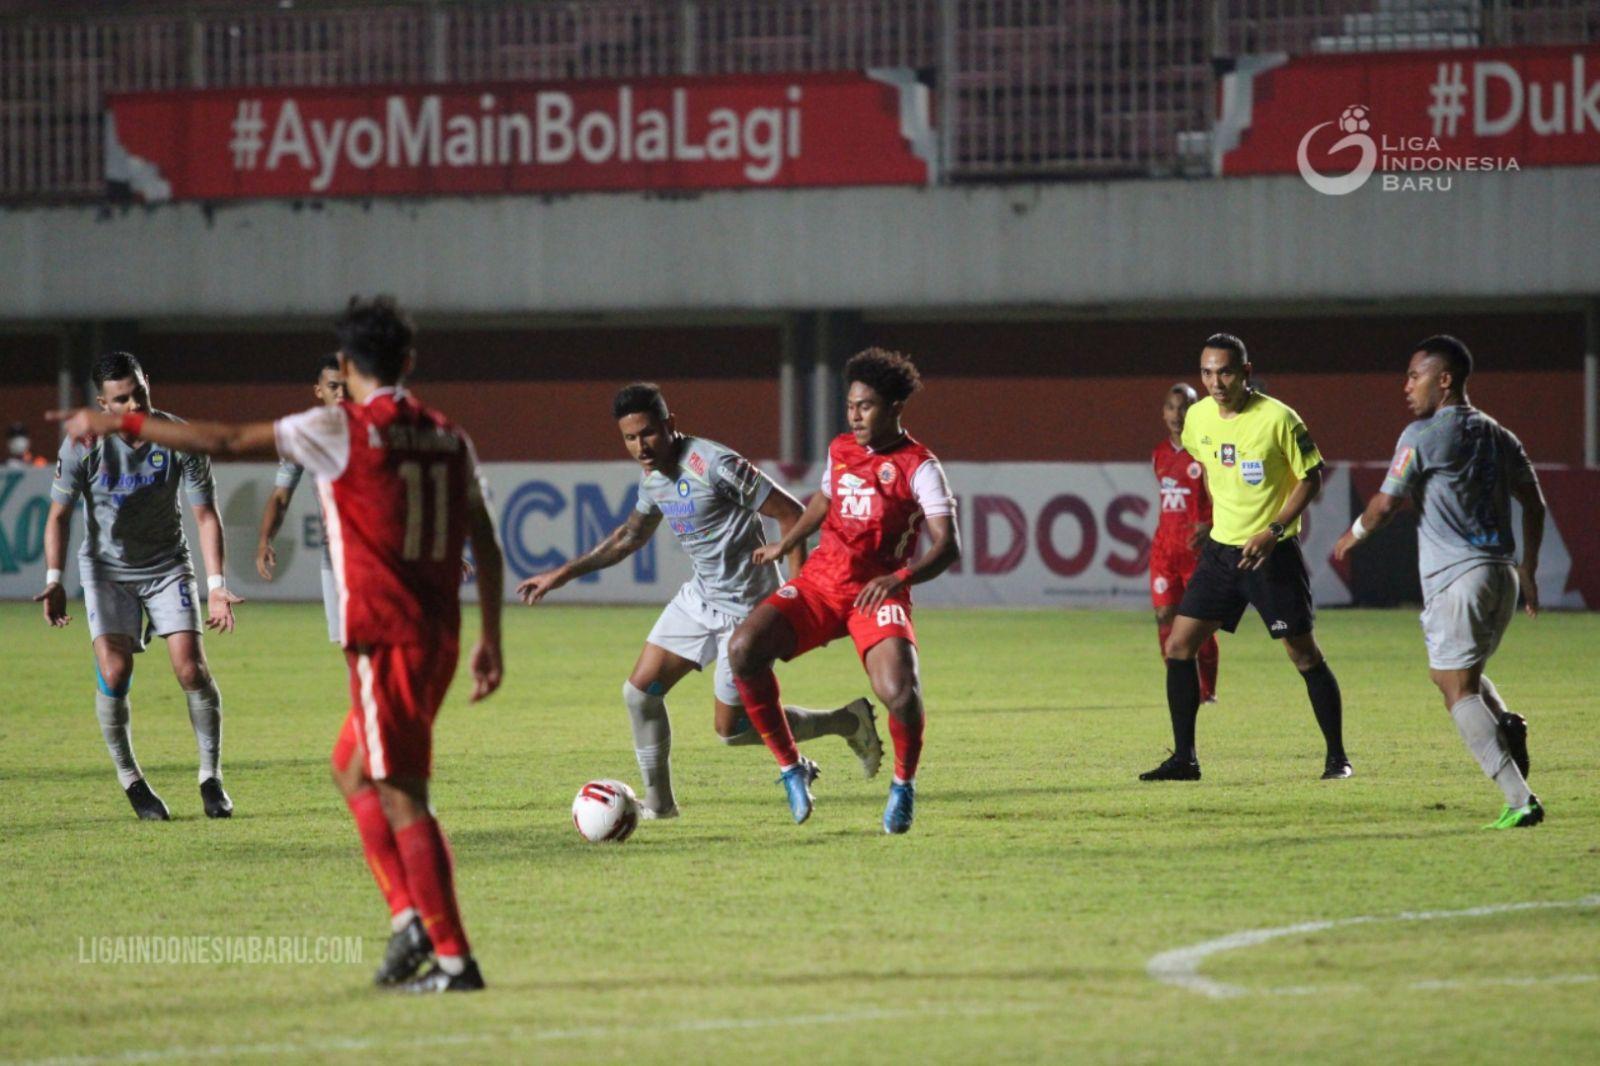 Dibantai Persija, Pelatih Persib Bongkar Borok Timnya